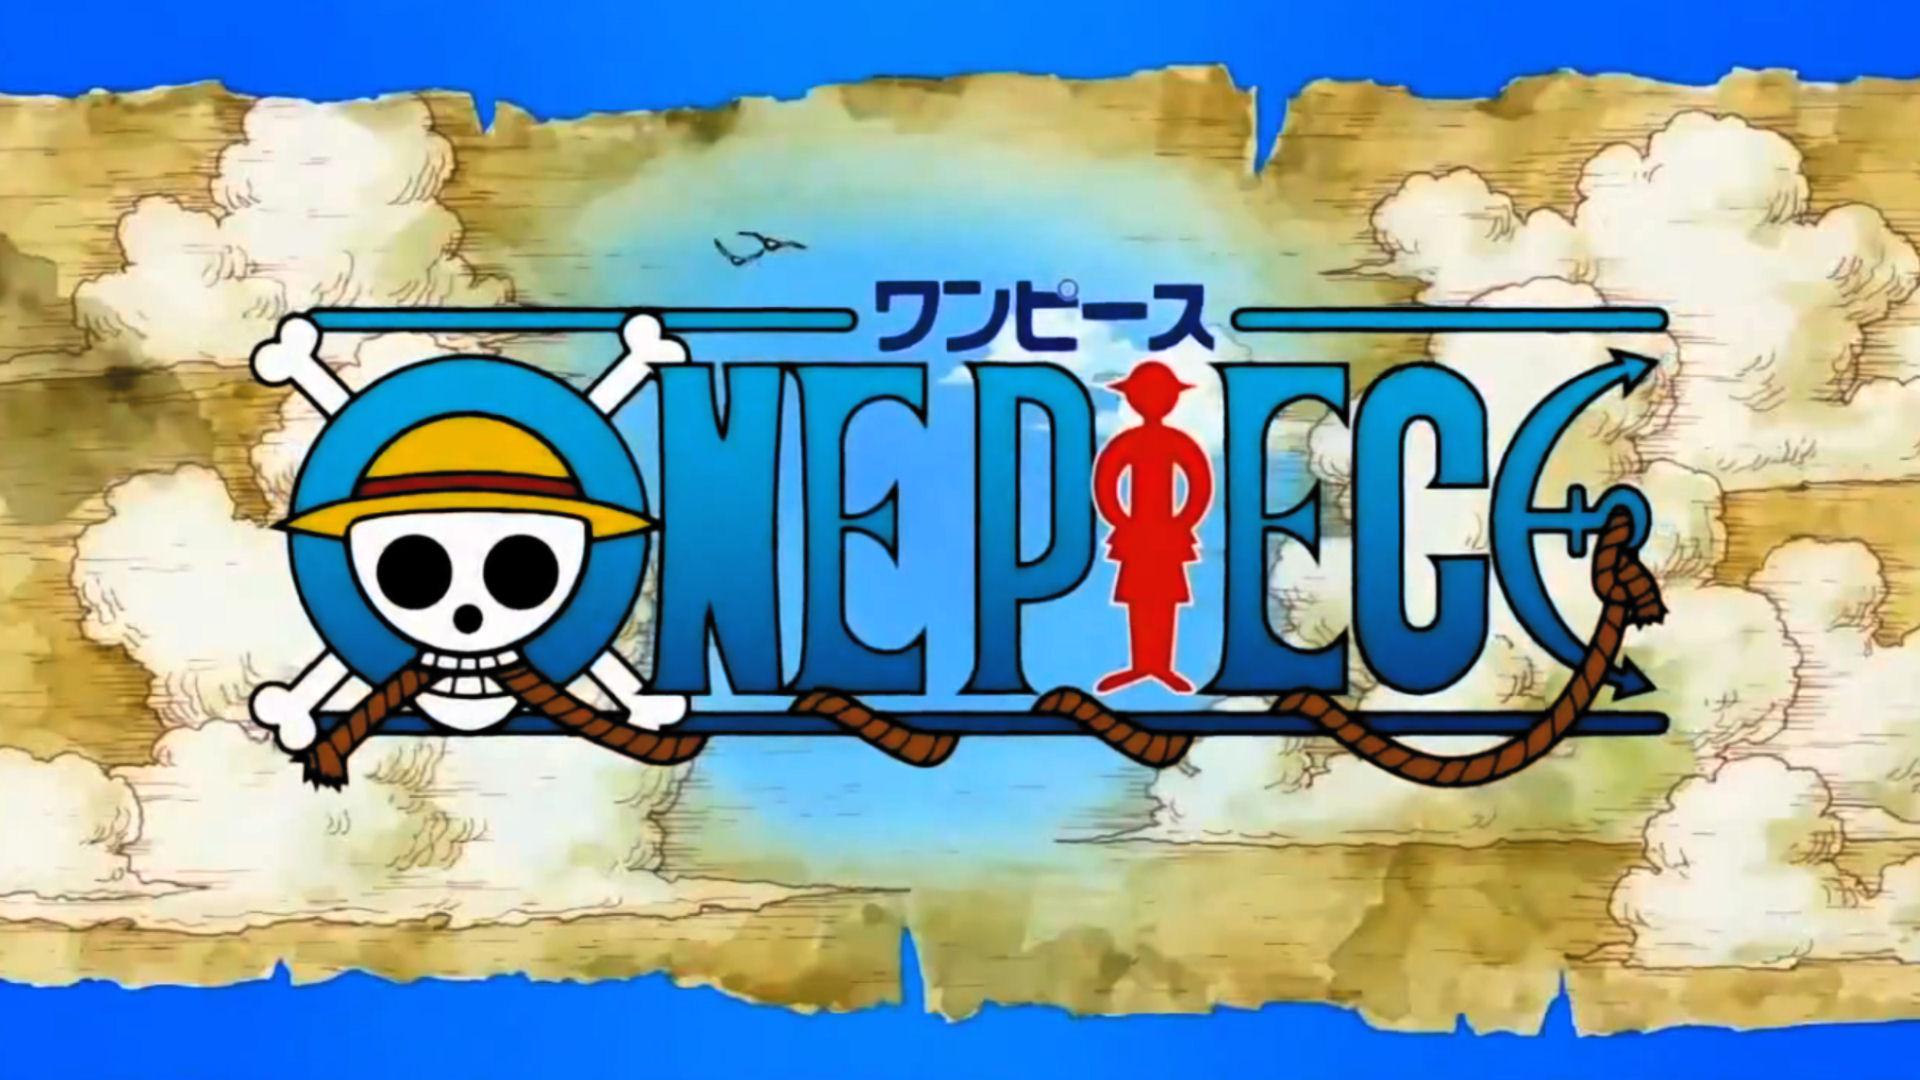 Google themes anime one piece - Anime One Piece Wallpapers Free Anime One Piece Hd Wallpapers Anime